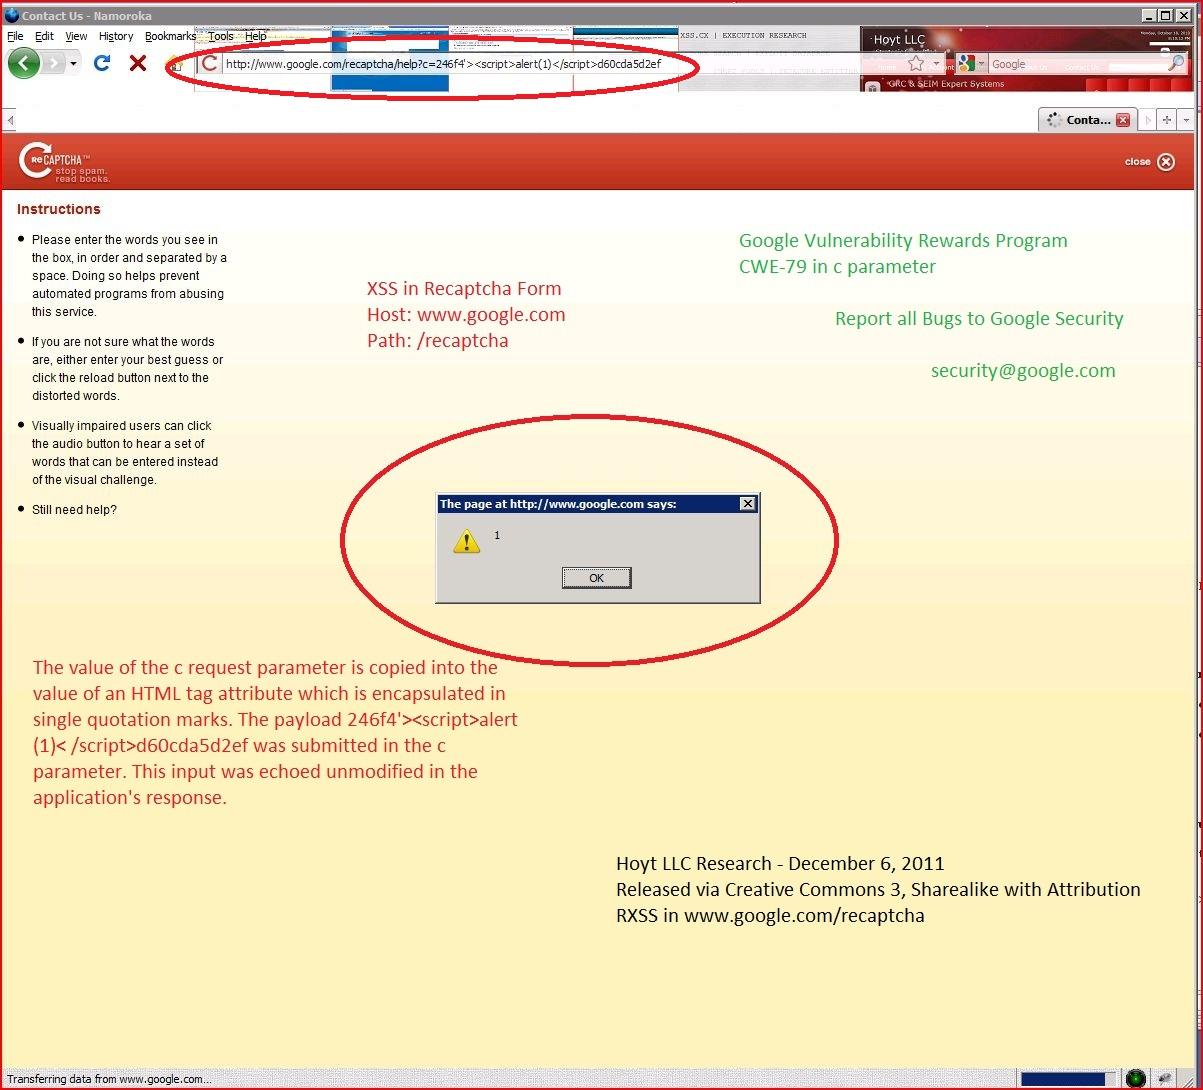 XSS in google.com, XSS, DORK, GHDB, Cross Site Scripting, CWE-79, CAPEC-86, Recaptcha Form